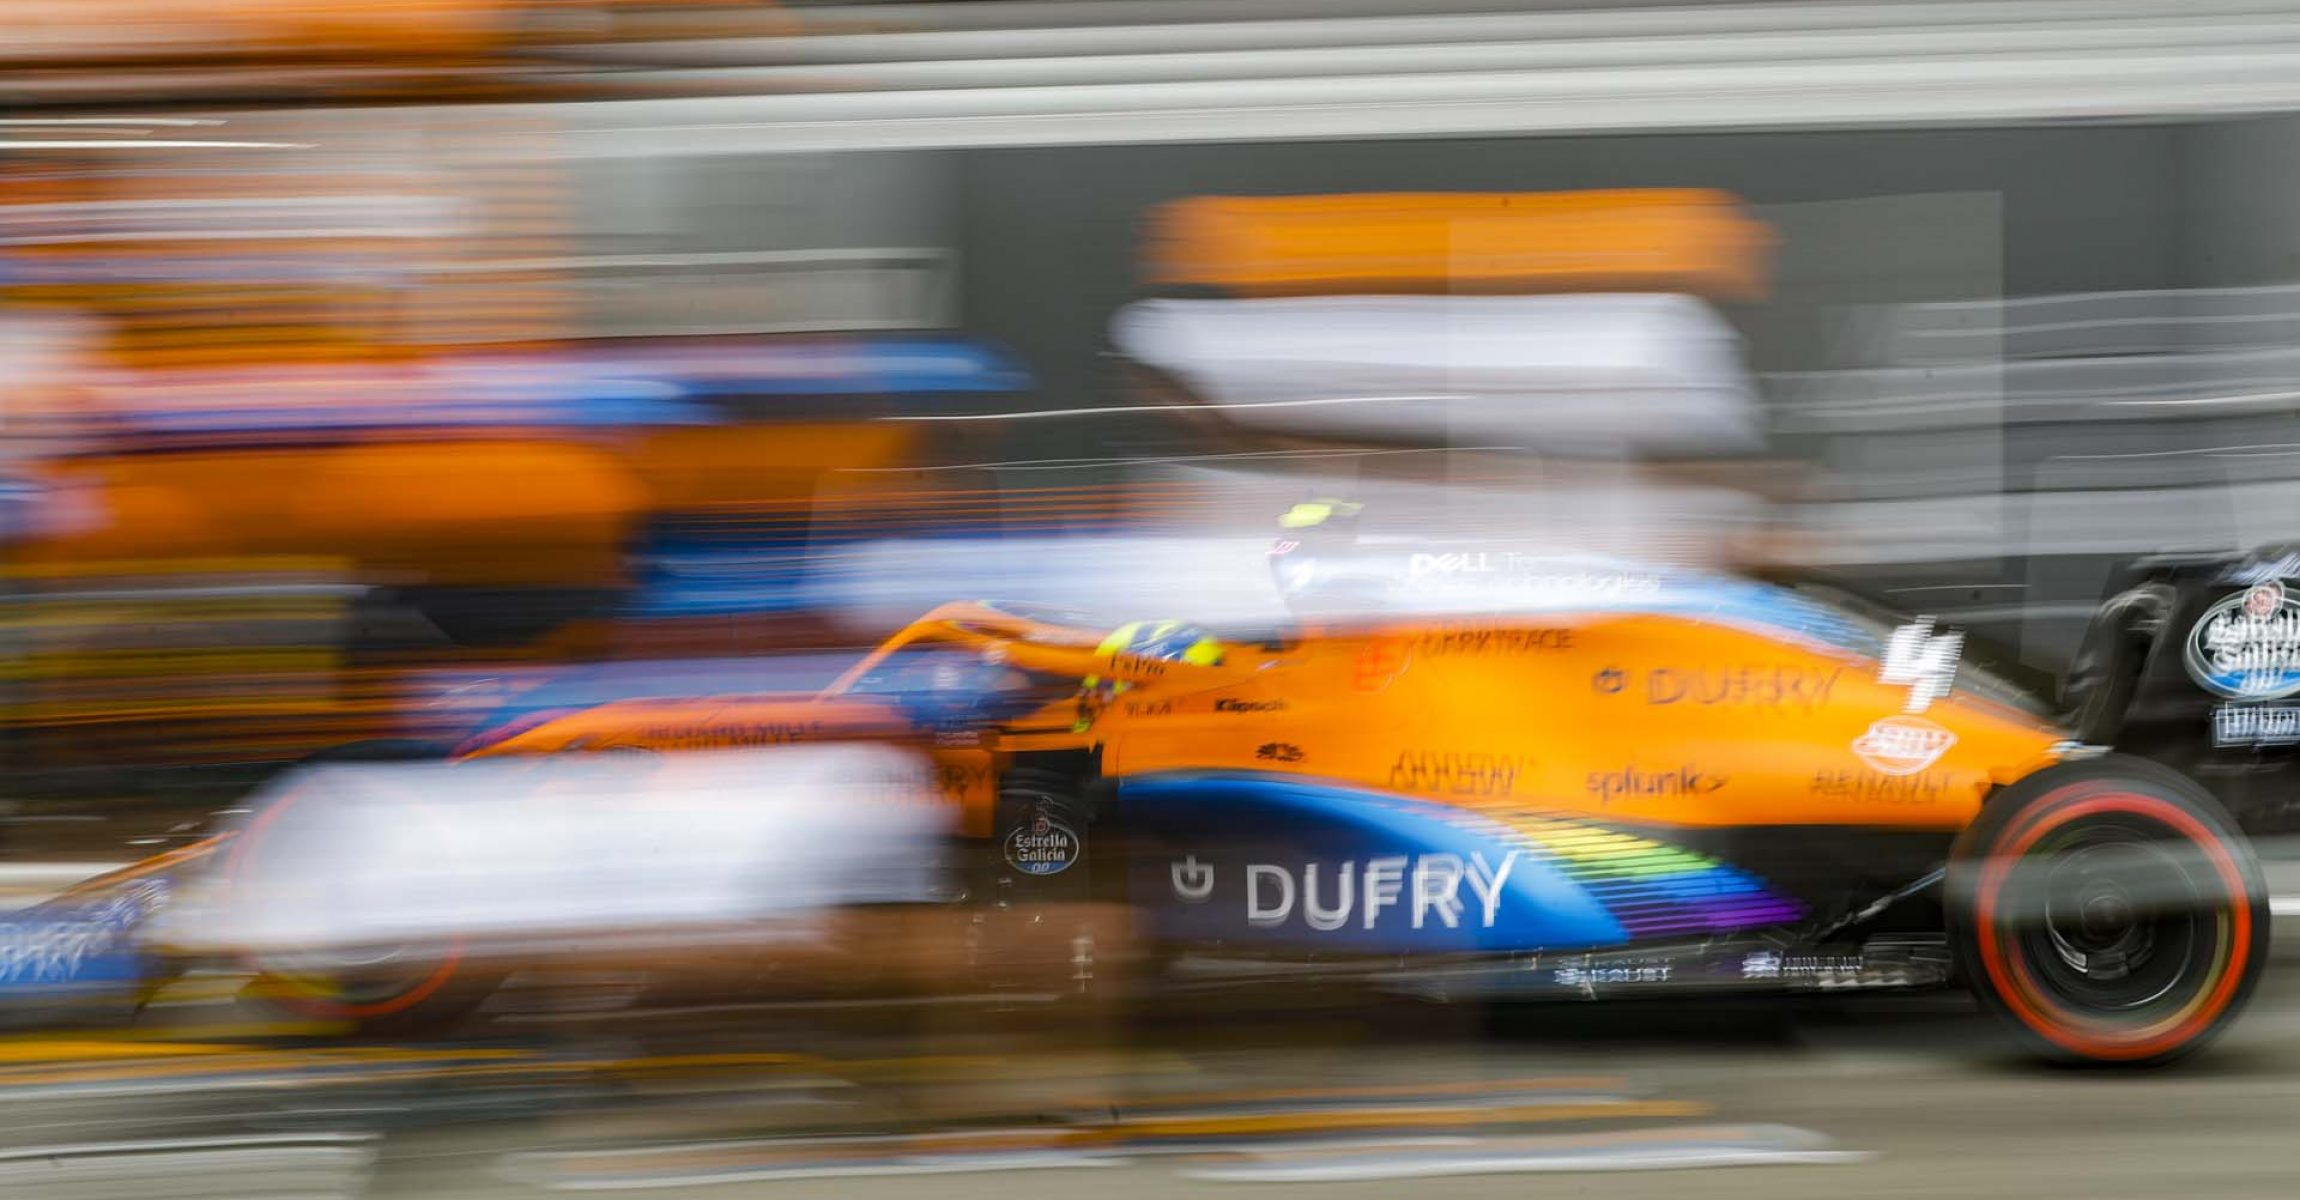 SPA-FRANCORCHAMPS, BELGIUM - AUGUST 28: Lando Norris, McLaren MCL35 during the Belgian GP at Spa-Francorchamps on Friday August 28, 2020 in Spa, Belgium. (Photo by Steven Tee / LAT Images)